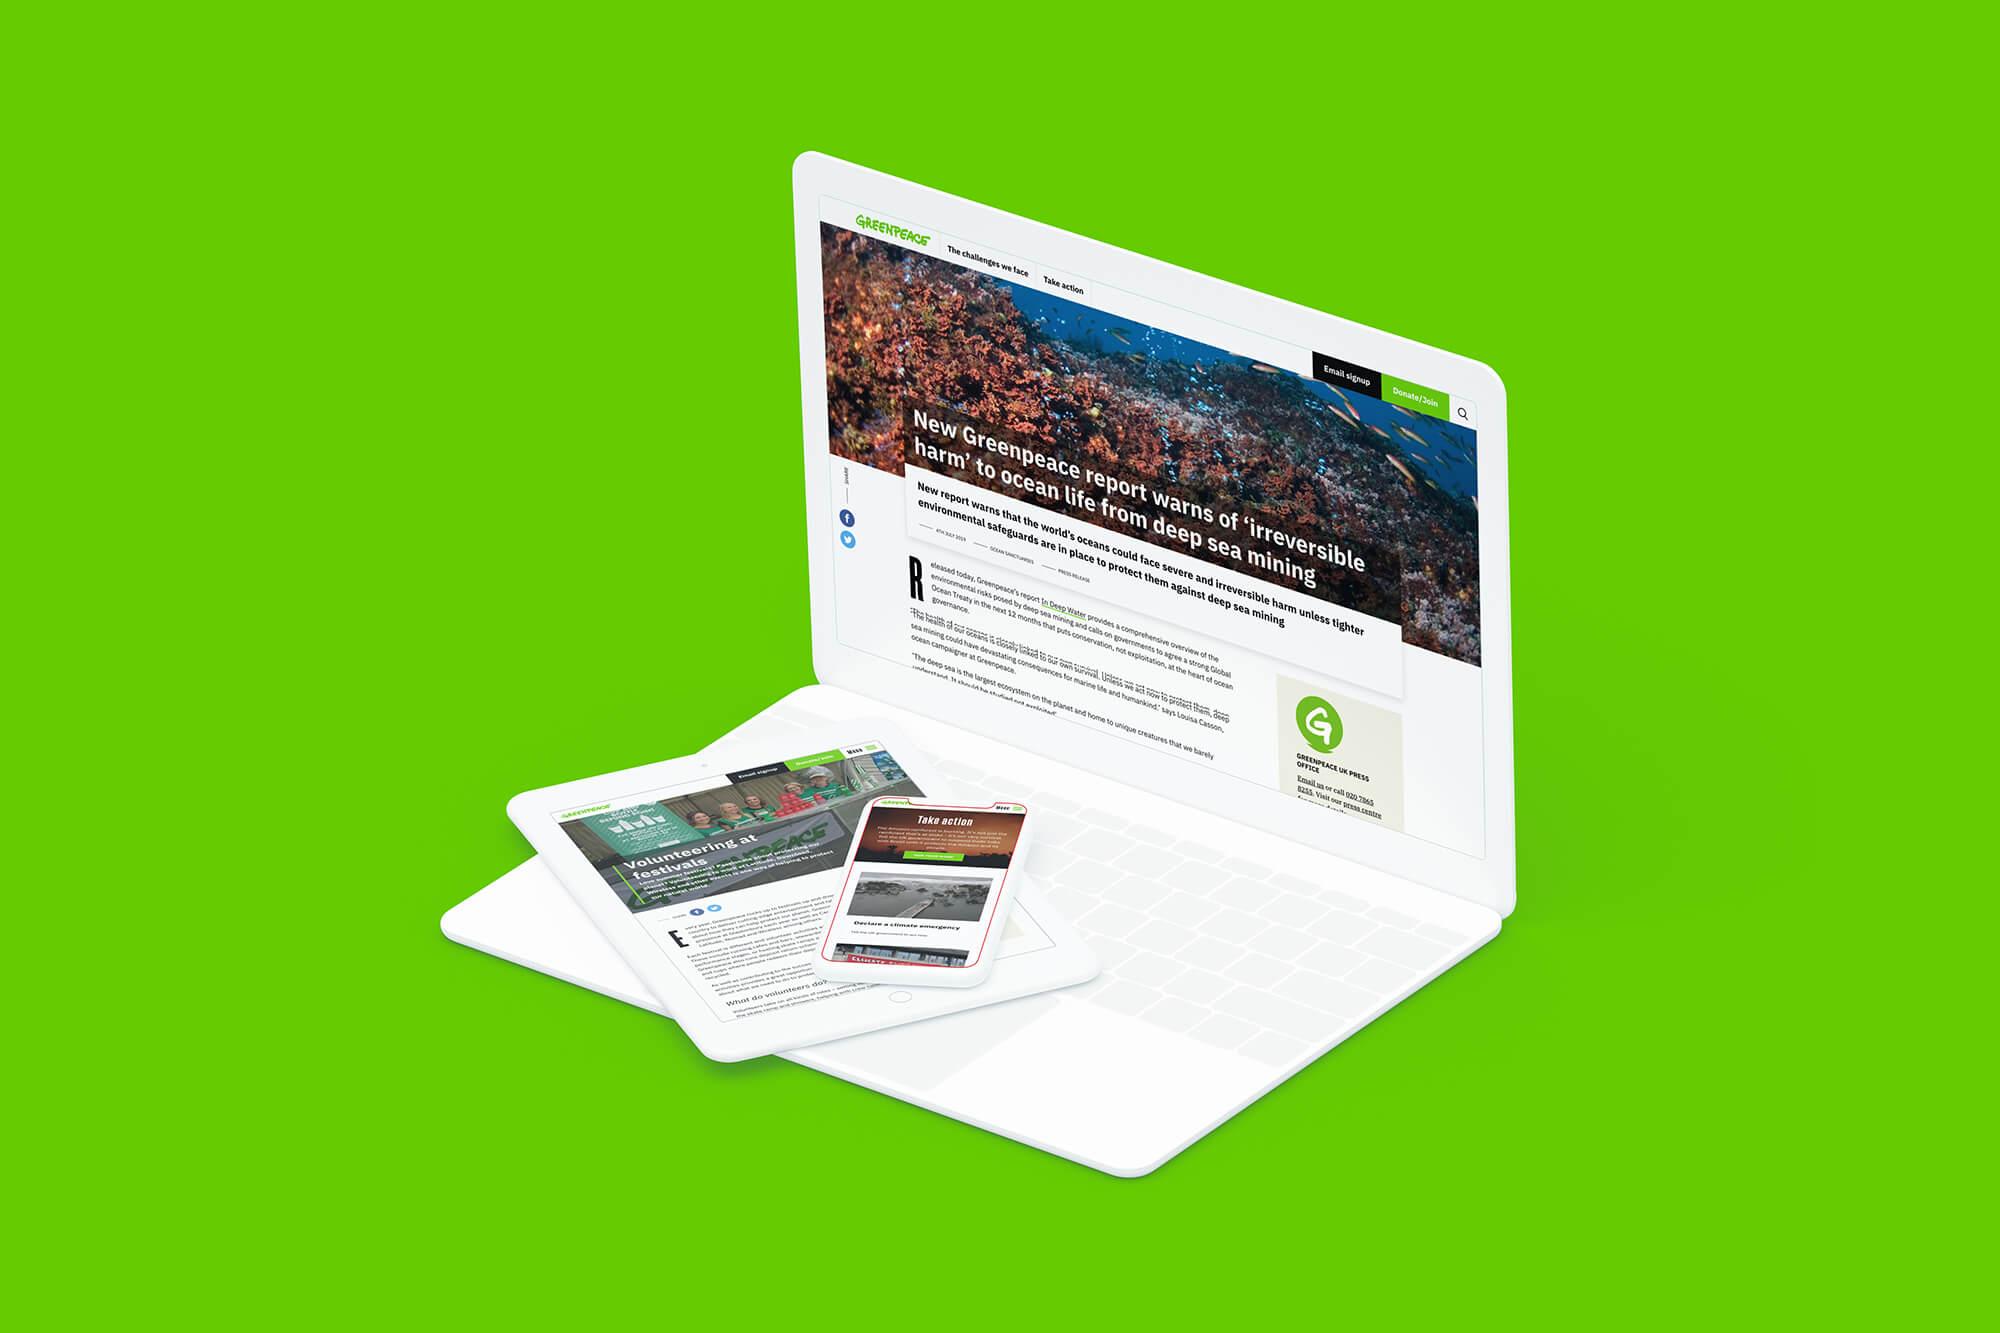 Greenpeace's site on desktop